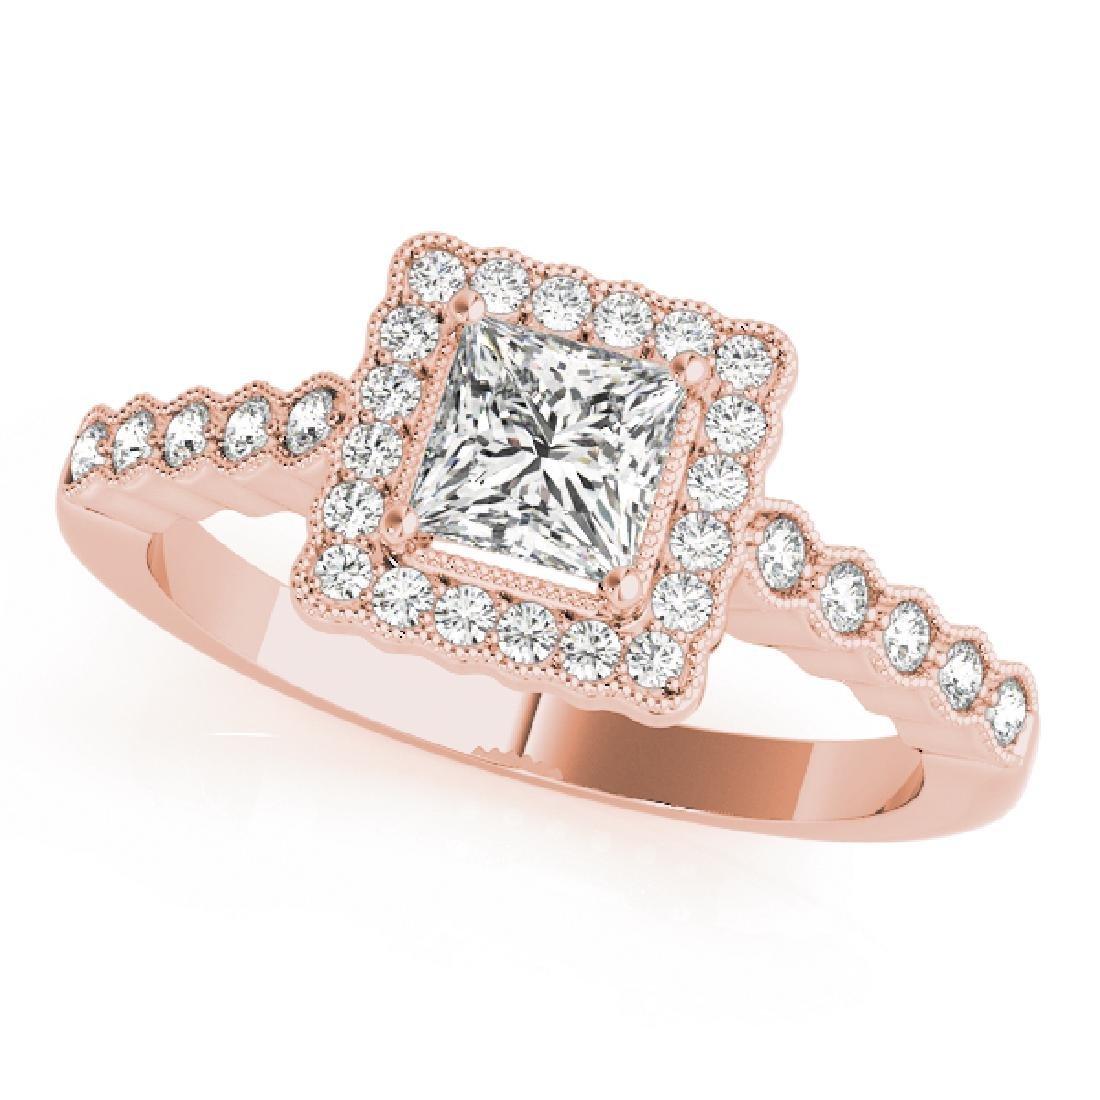 CERTIFIED 18K ROSE GOLD 0.95 CT G-H/VS-SI1 DIAMOND HALO